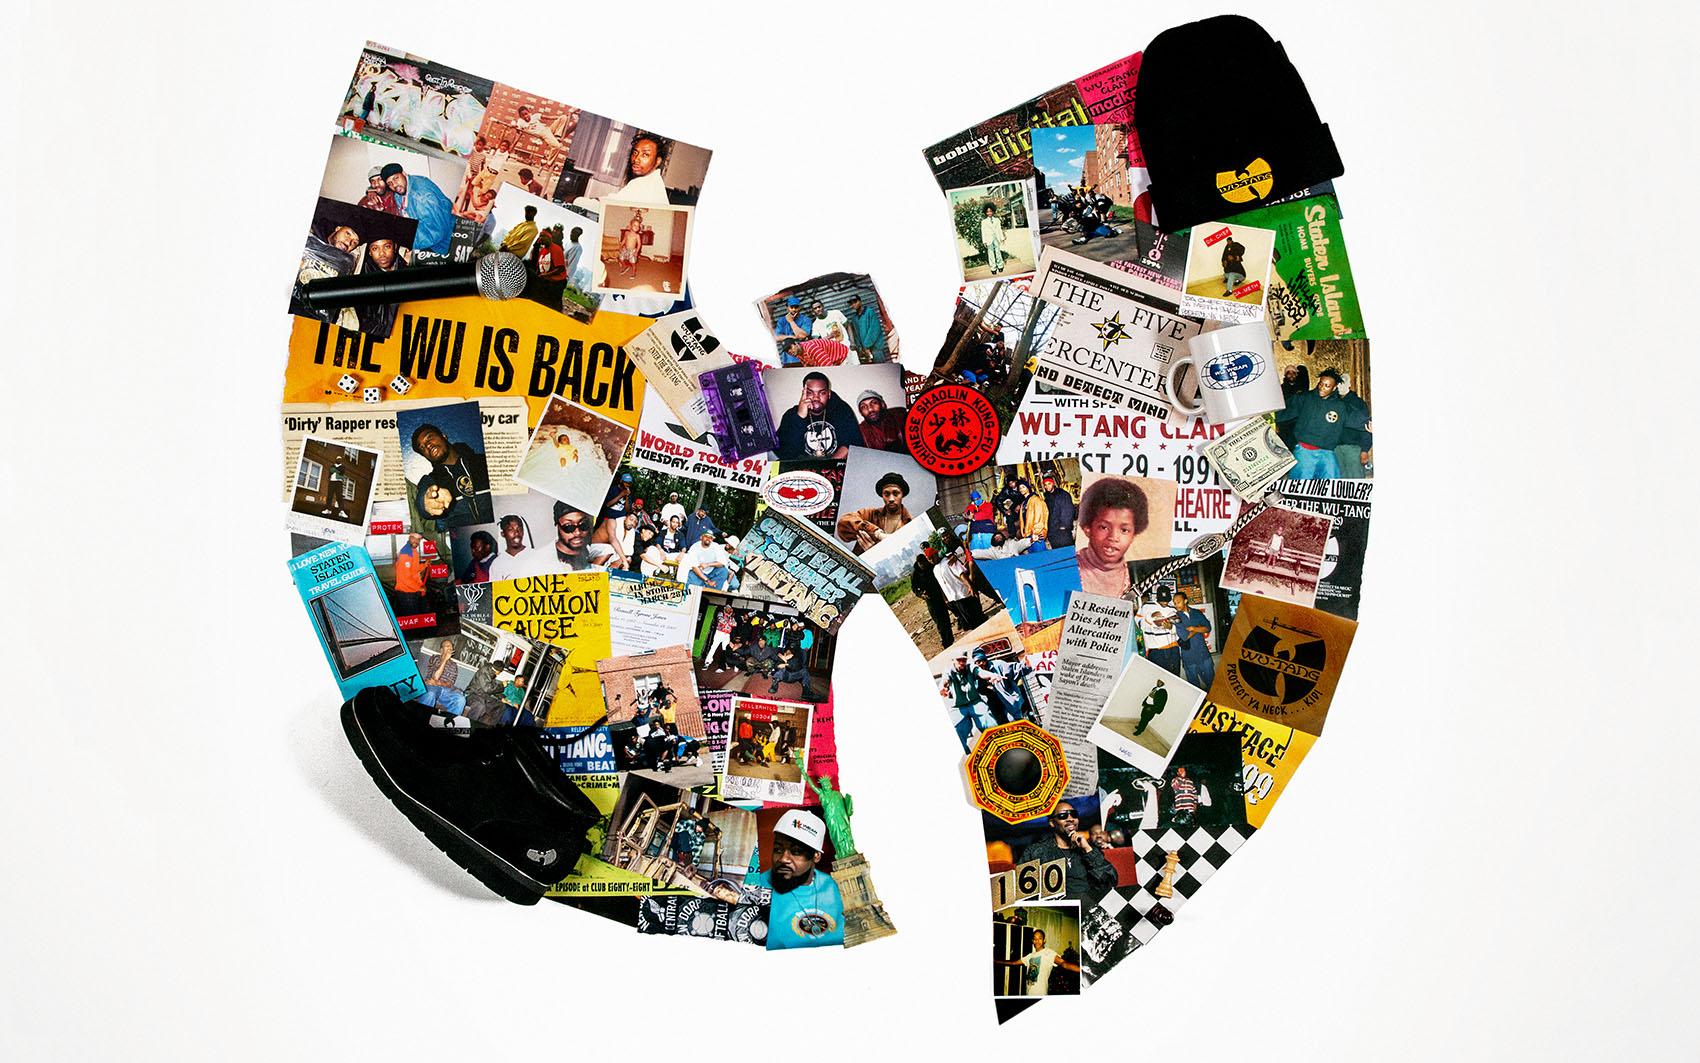 Wallpaper Wu Tang Clan Wu Tang Hip Hop Rap Boom Bap